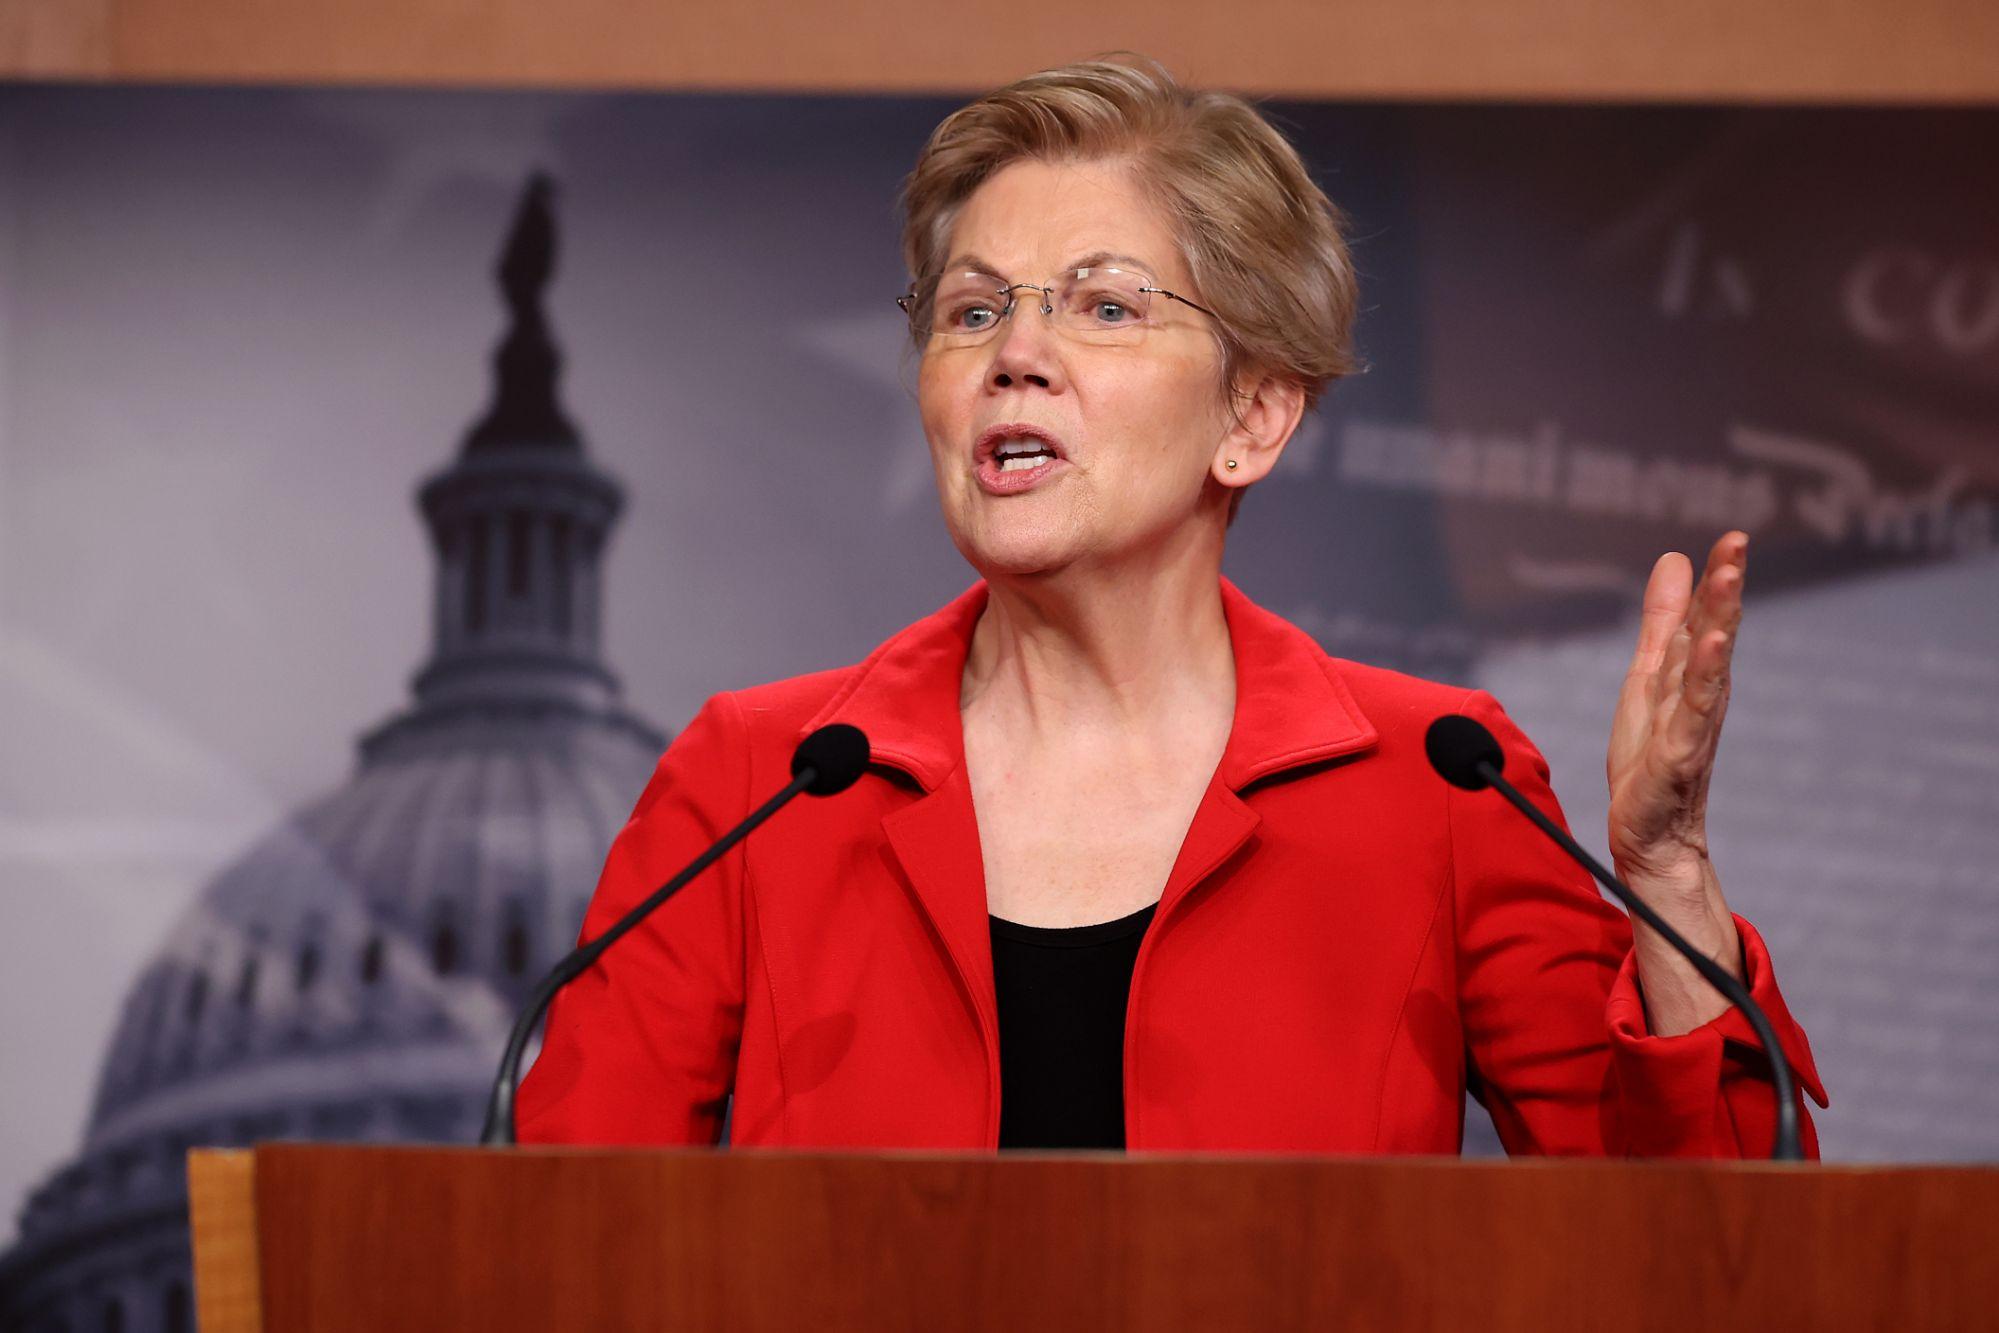 Access here alternative investment news about Elizabeth Warren's Wealth Tax Won't Work. This Will